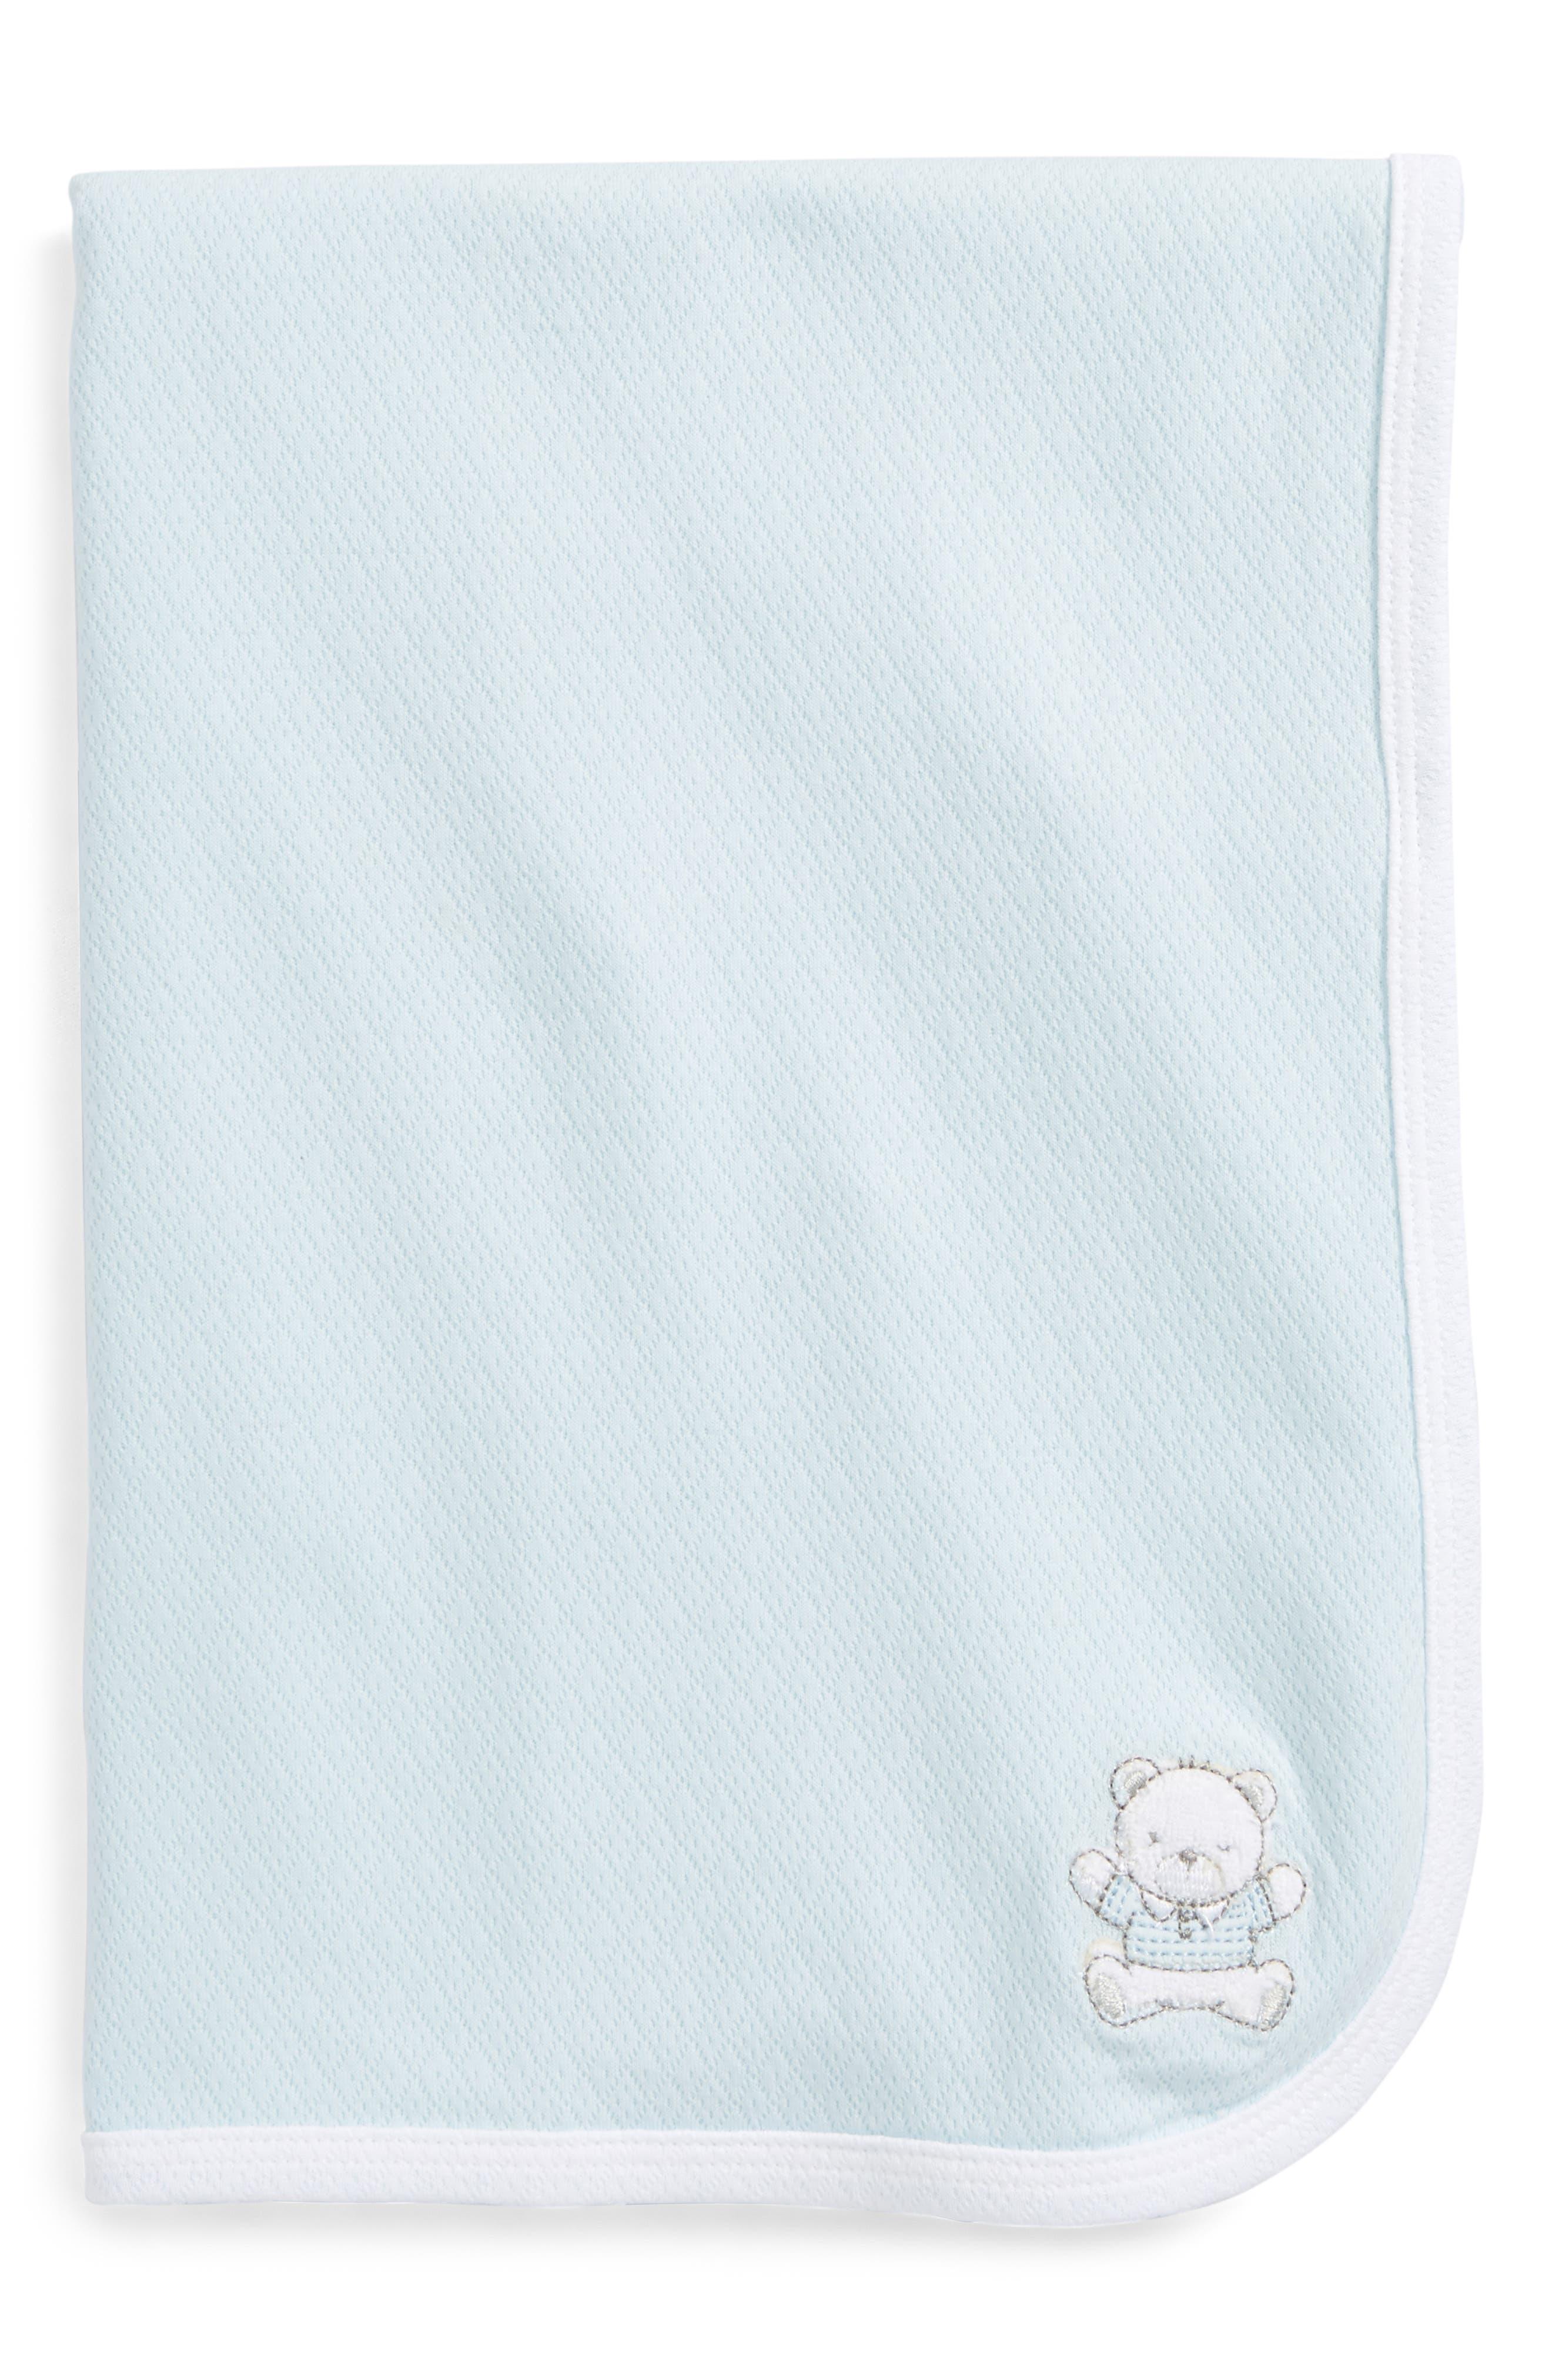 Bear Receiving Blanket,                             Main thumbnail 1, color,                             LIGHT BLUE